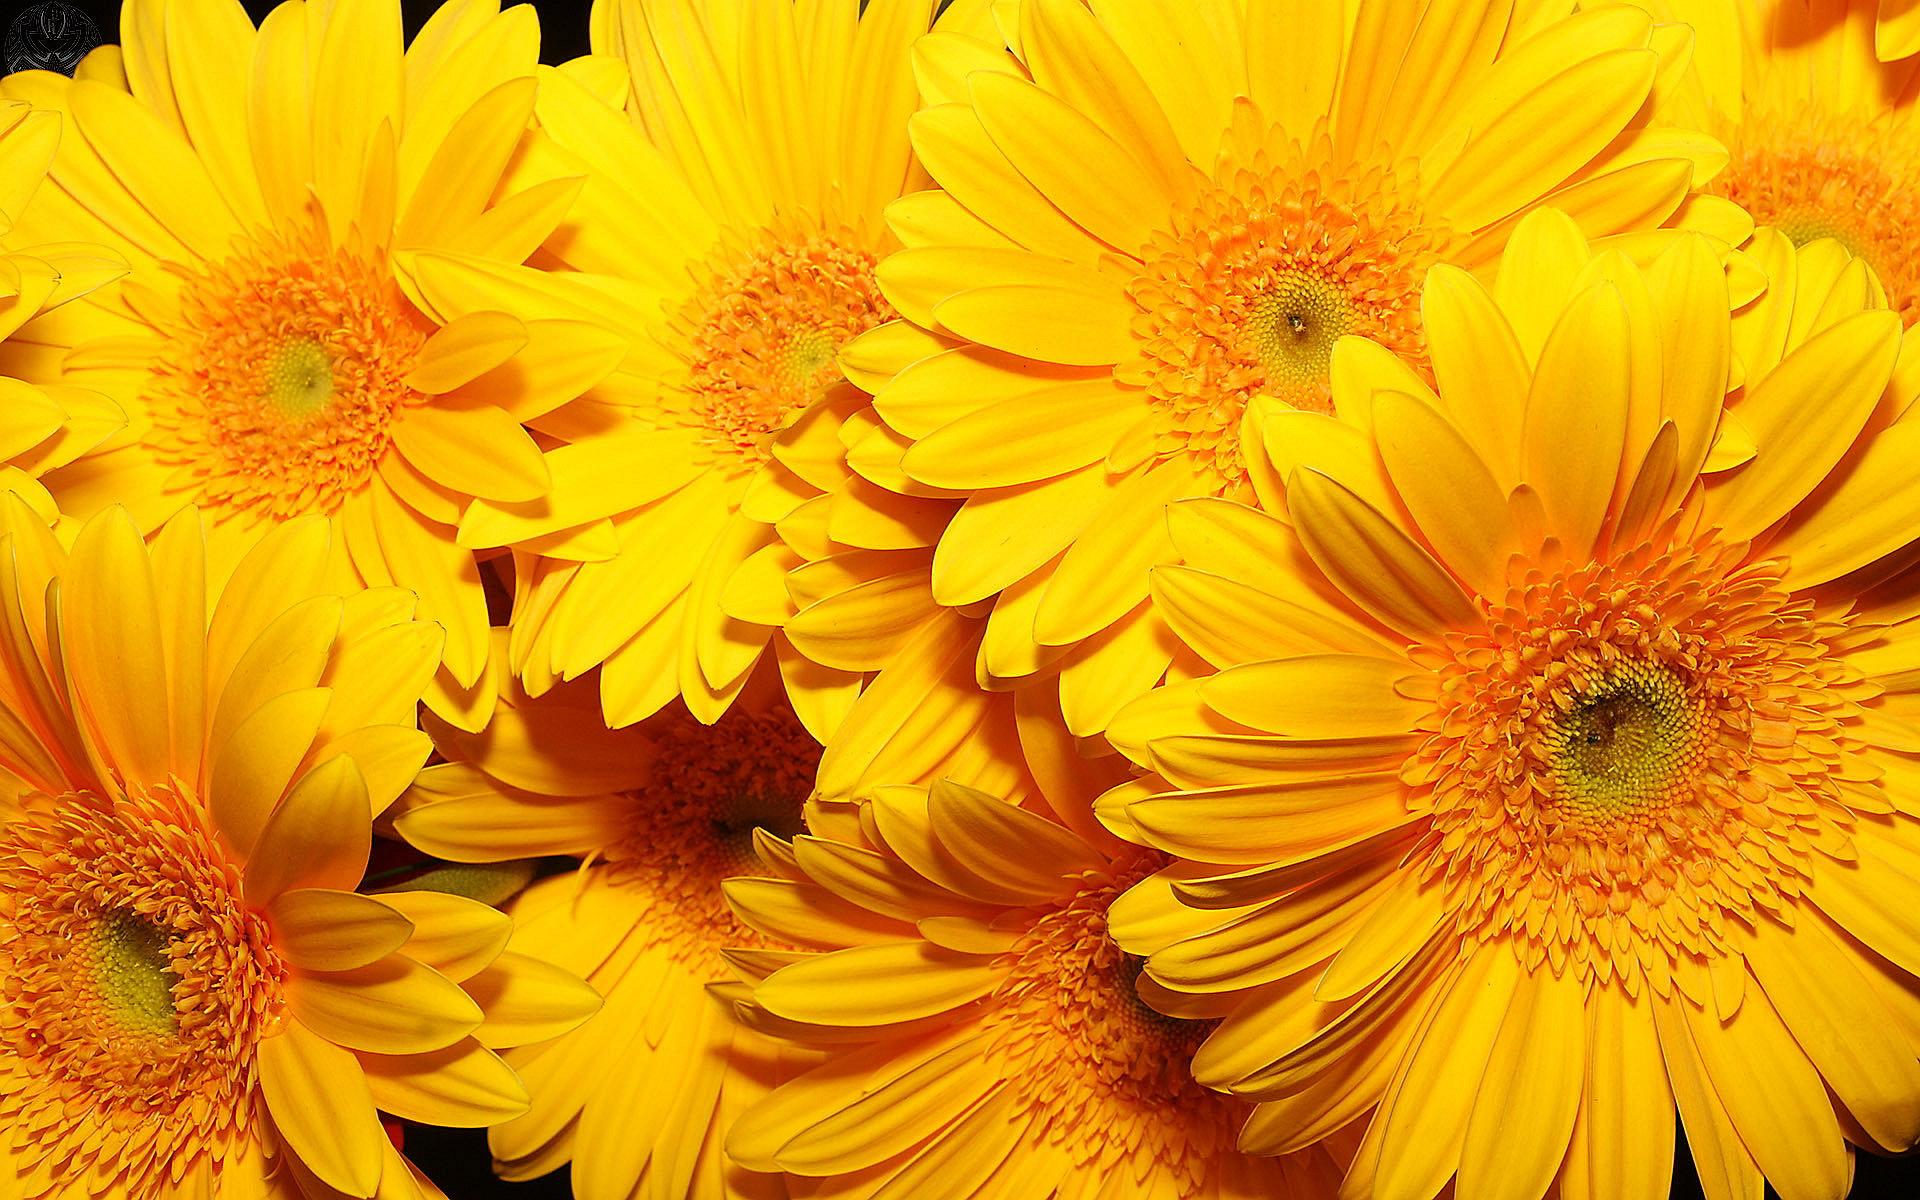 Hd wallpaper yellow flowers - Nature Yellow Flowers